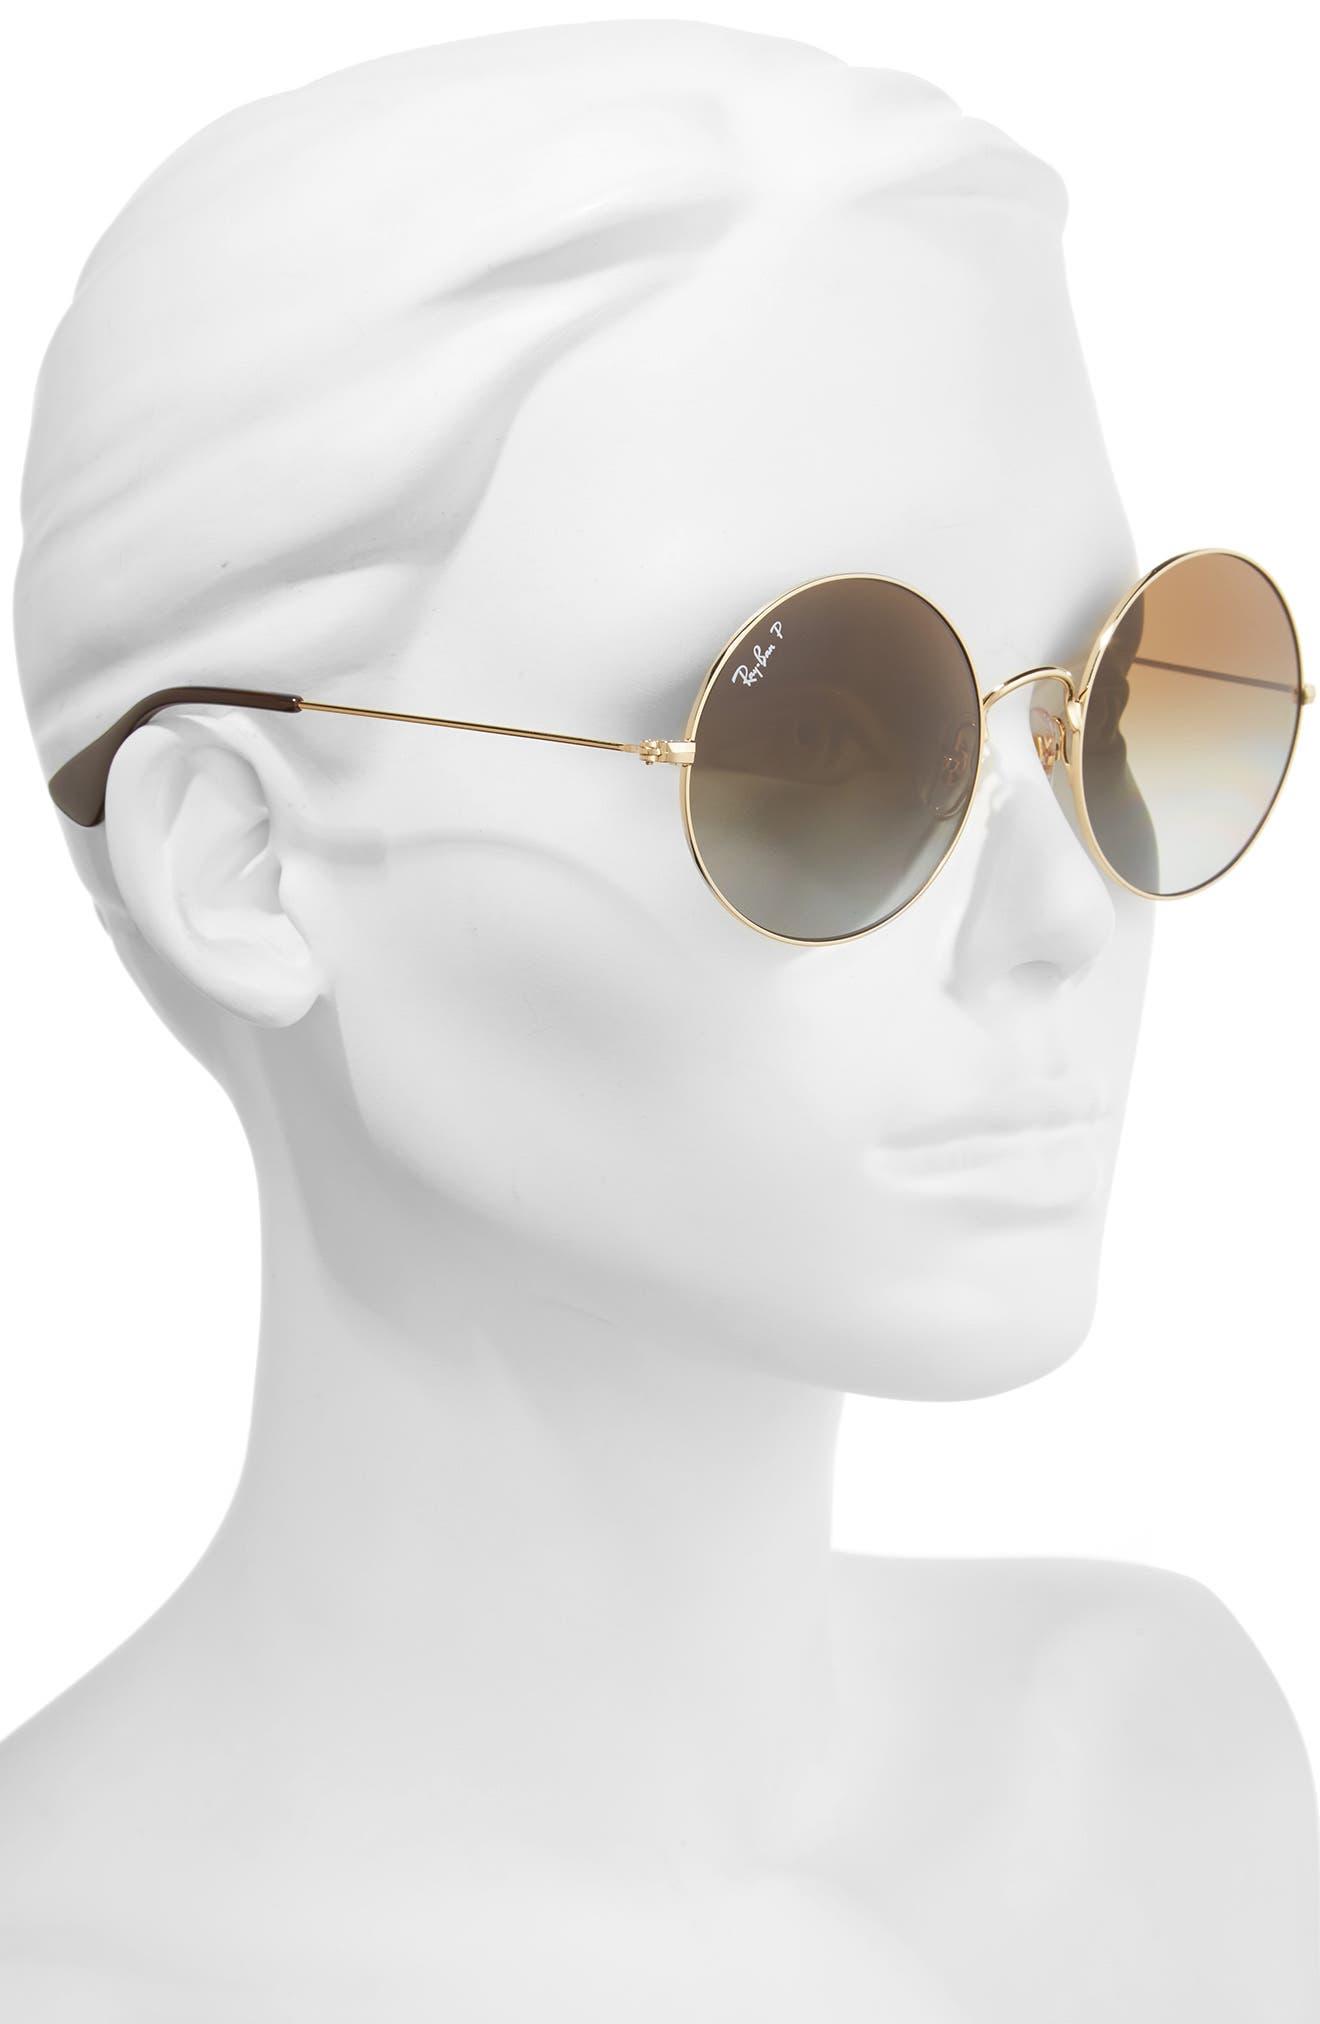 55mm Polarized Round Sunglasses,                             Alternate thumbnail 4, color,